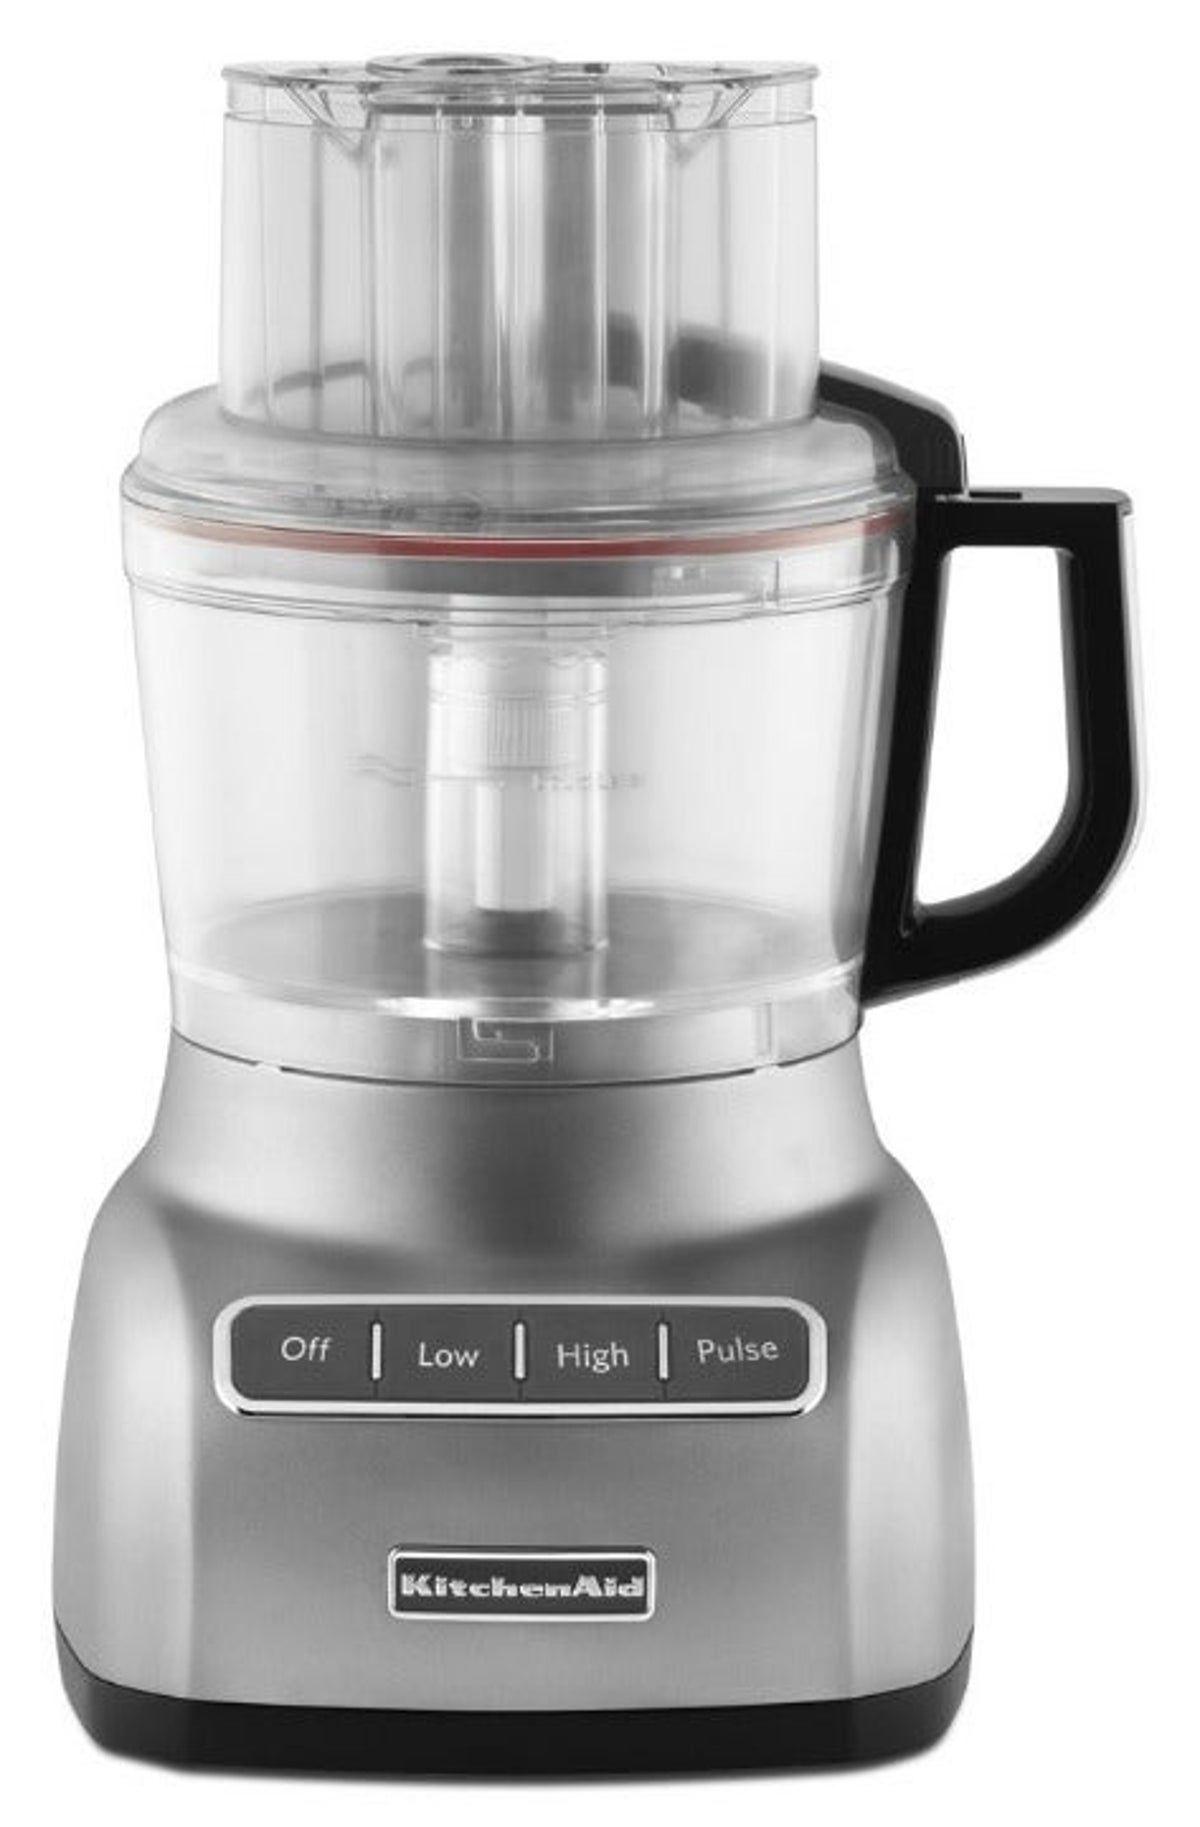 Kitchenaid 9 cup food processor food processor recipes